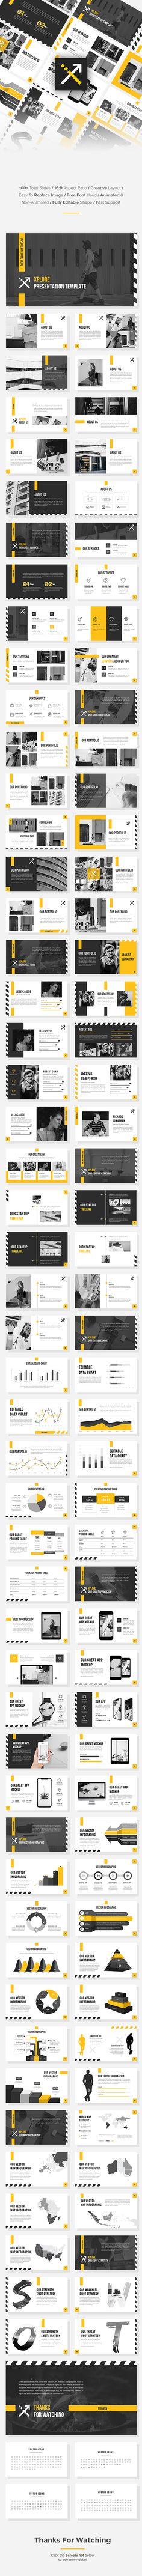 XPlore - StartUp PowerPoint Template - Pitch Deck PowerPoint Templates